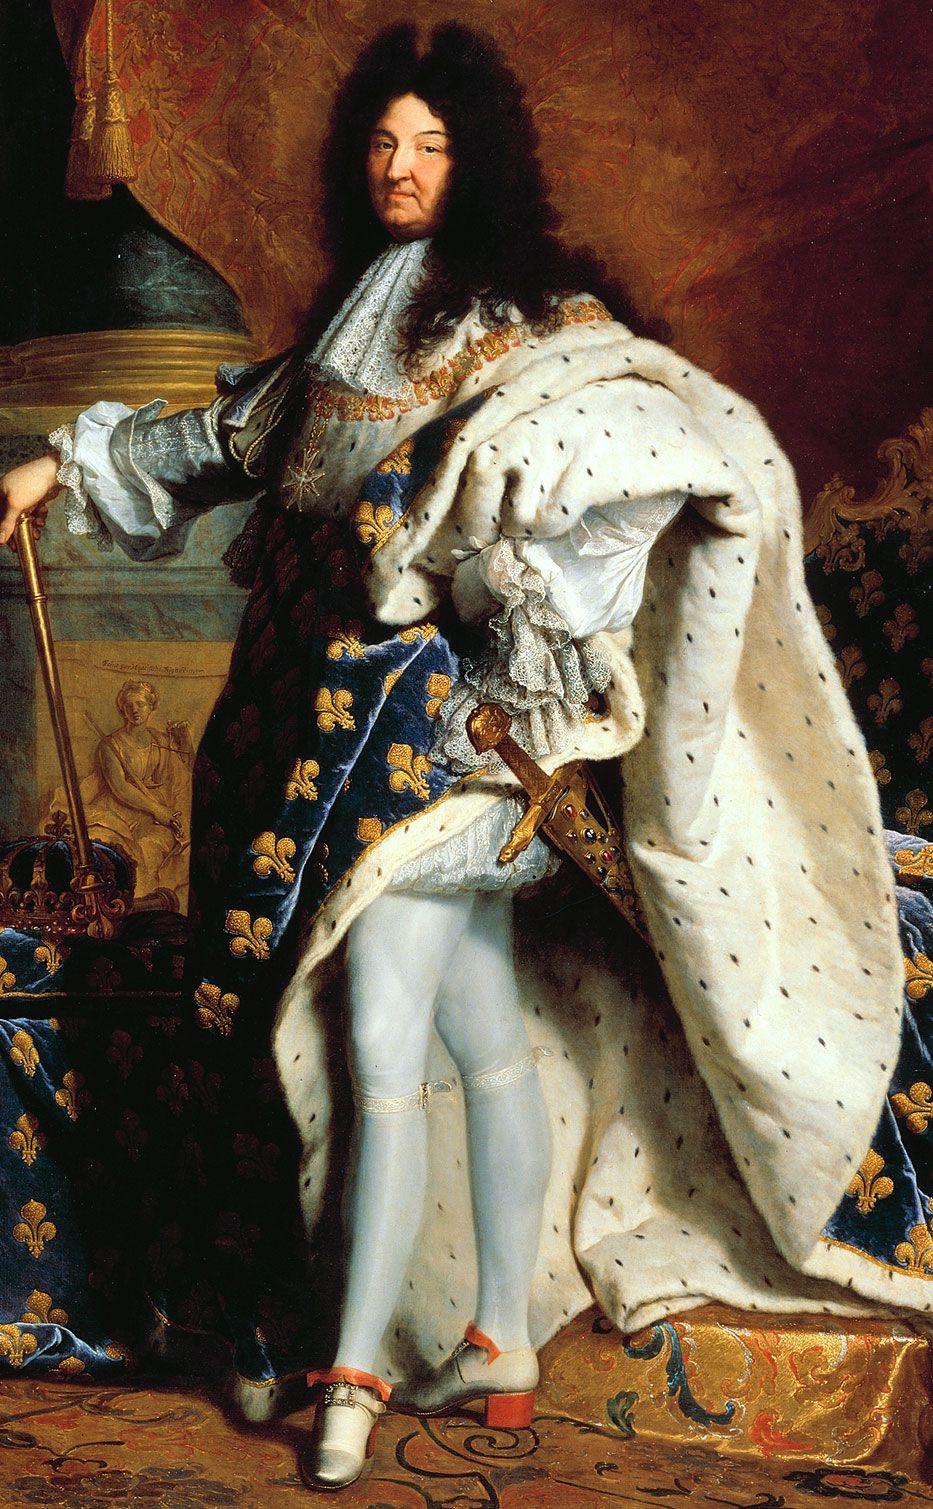 Taille De Louis Xiv : taille, louis, Heels, Popular, Among, Before, Women, Louis, Palace, Versailles,, Versailles